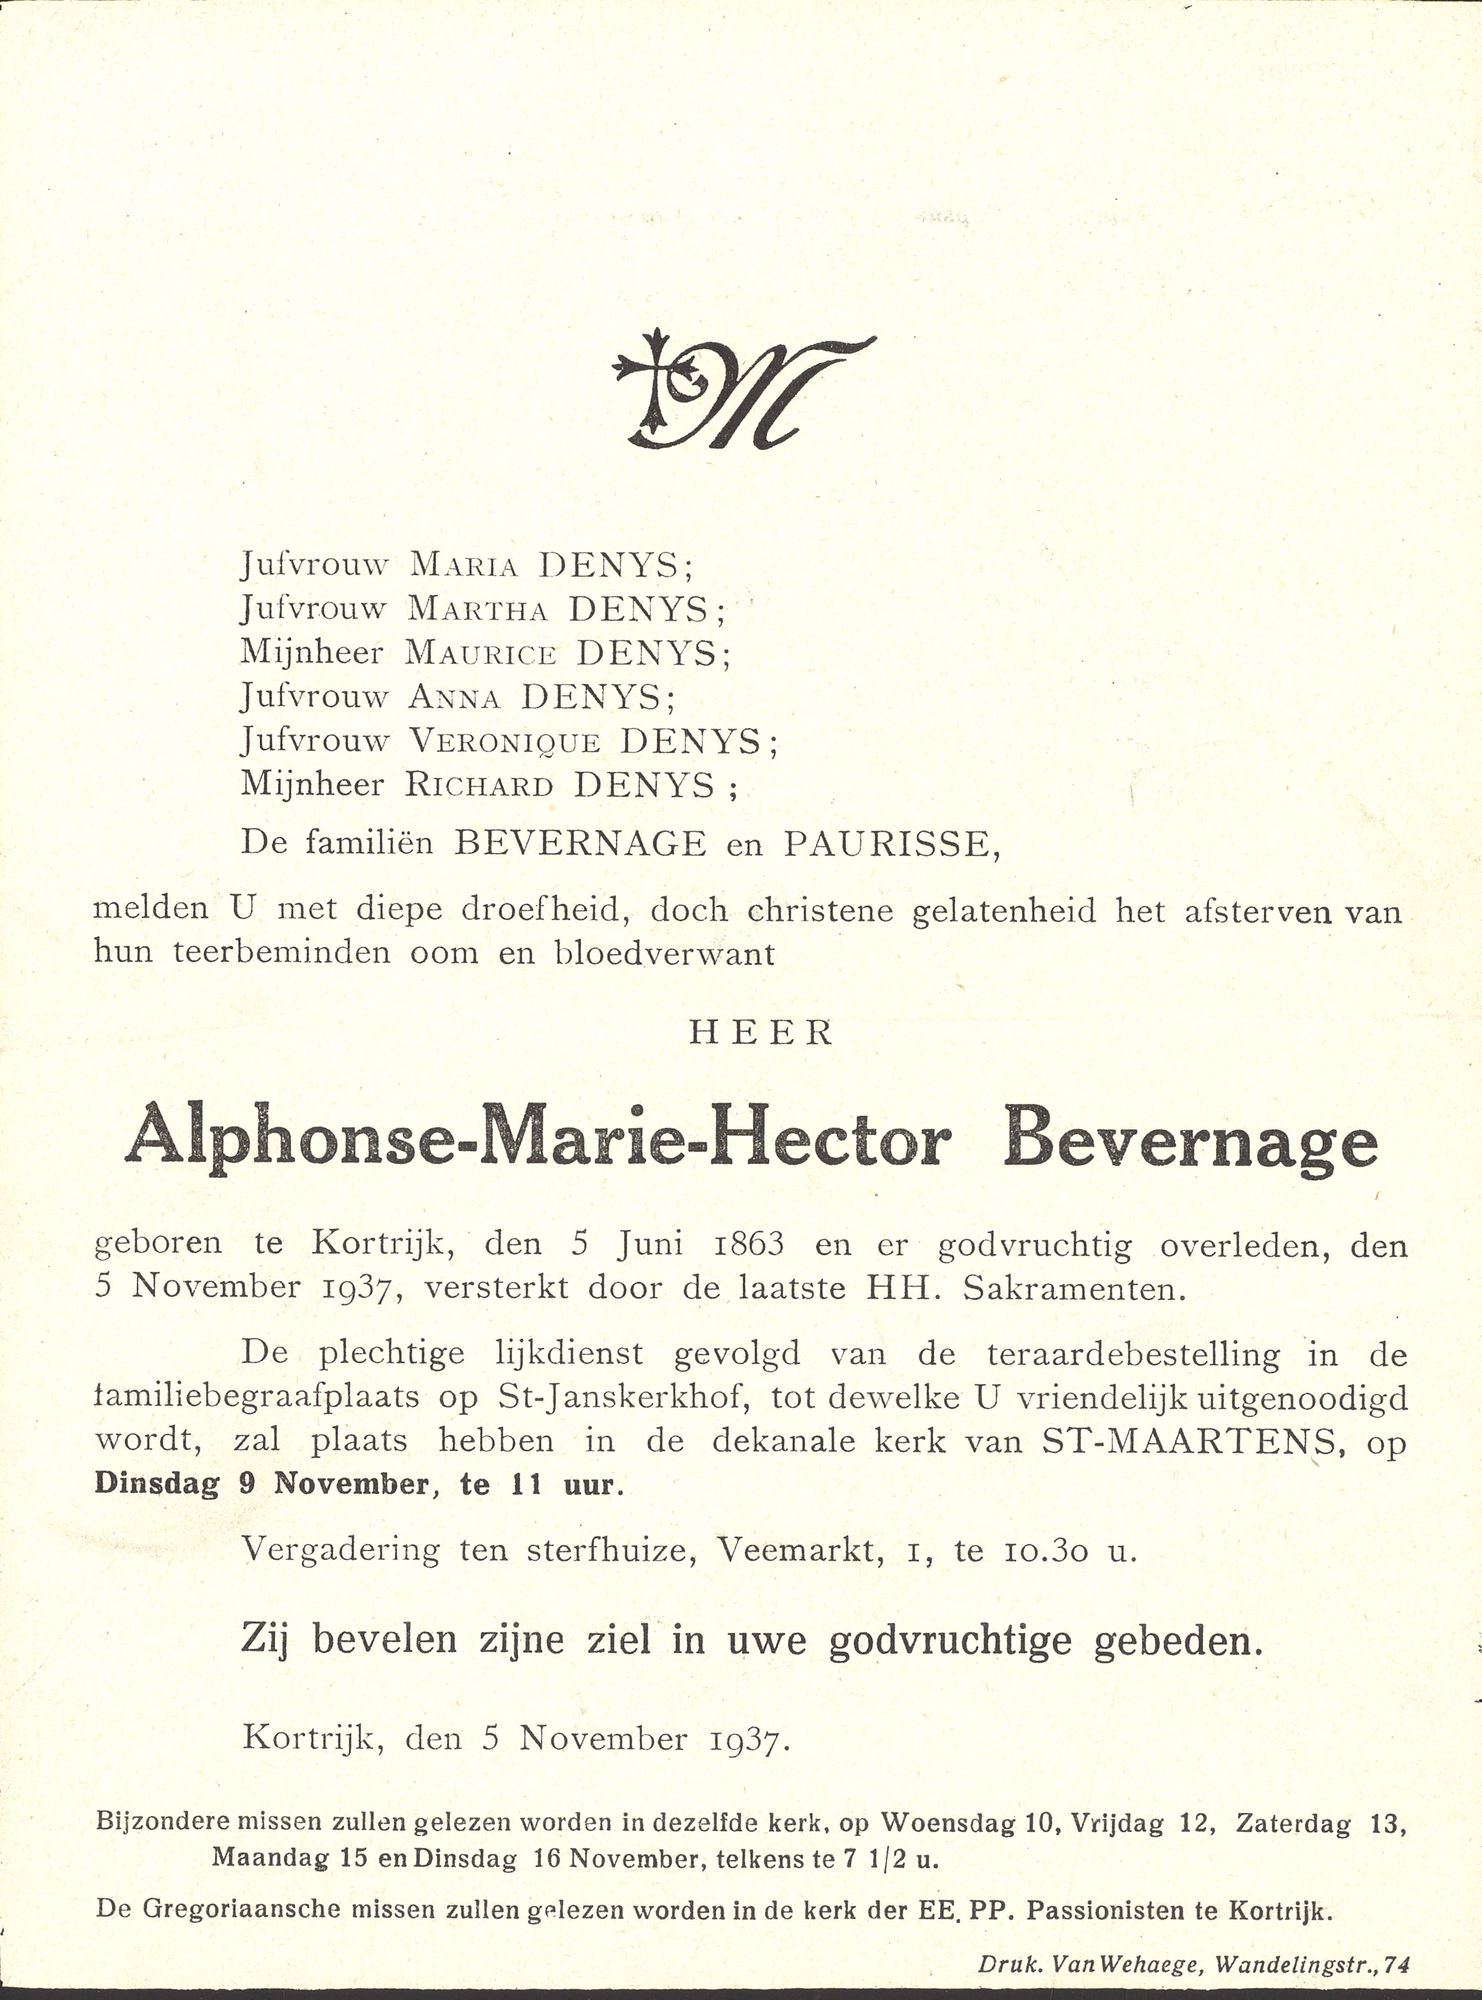 Alphonse-Marie-Hector Bevernage